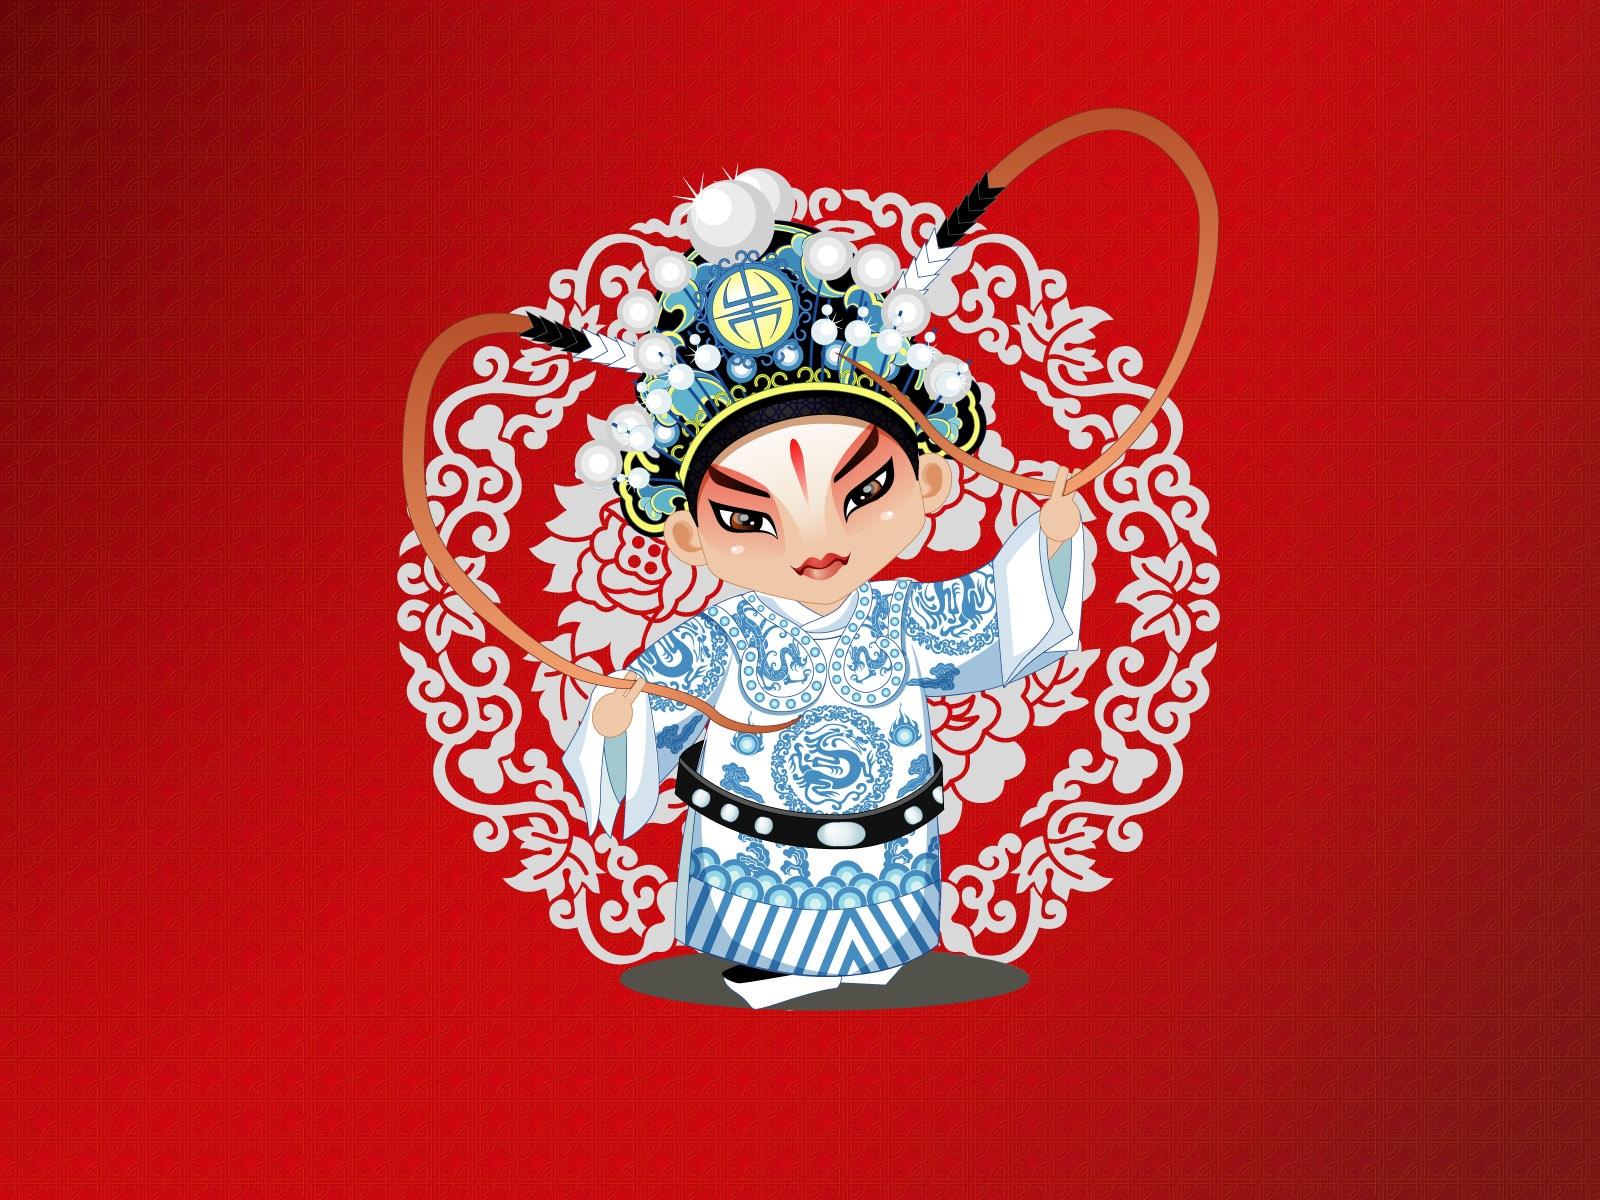 http://1.bp.blogspot.com/-LpuQ1lMK0ds/T5JgP8FXrvI/AAAAAAAAAJ0/ZEGfM5RuIA8/s1600/Beijing+Opera10.jpg